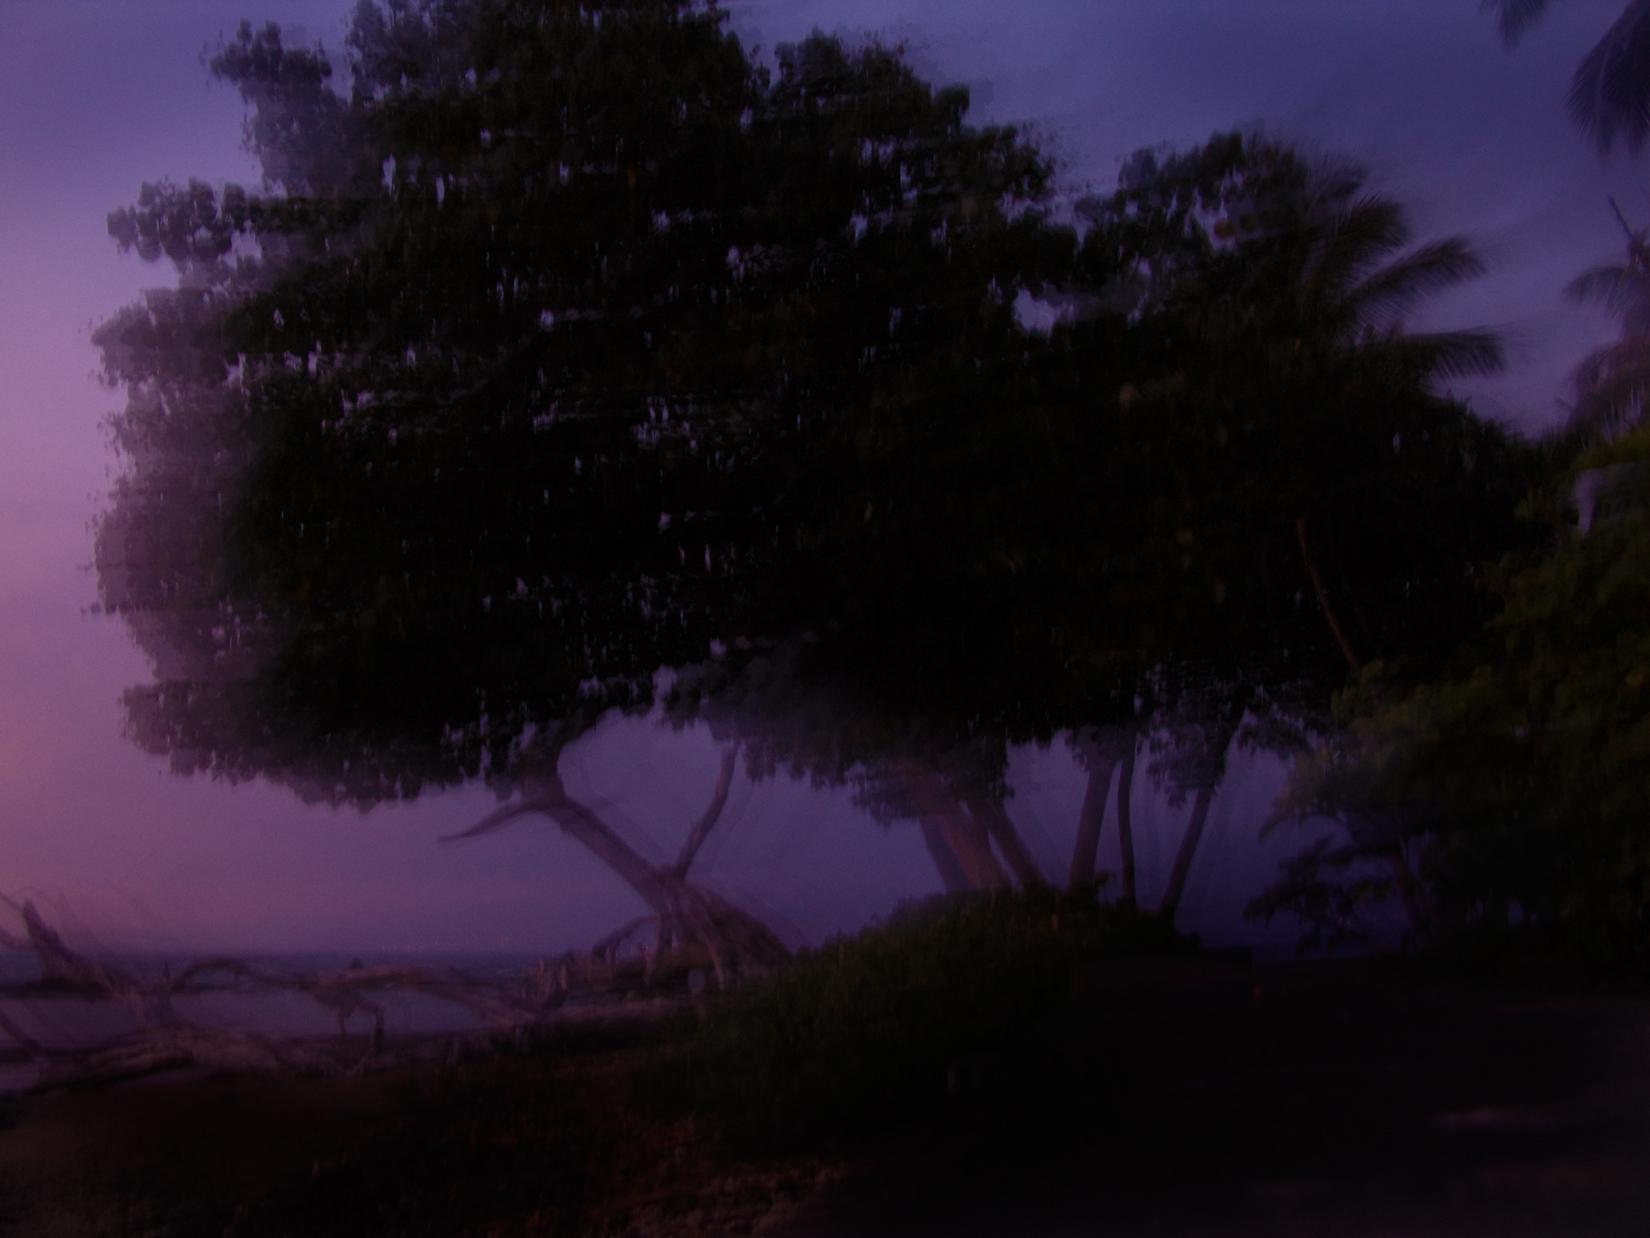 evening tree.jpg